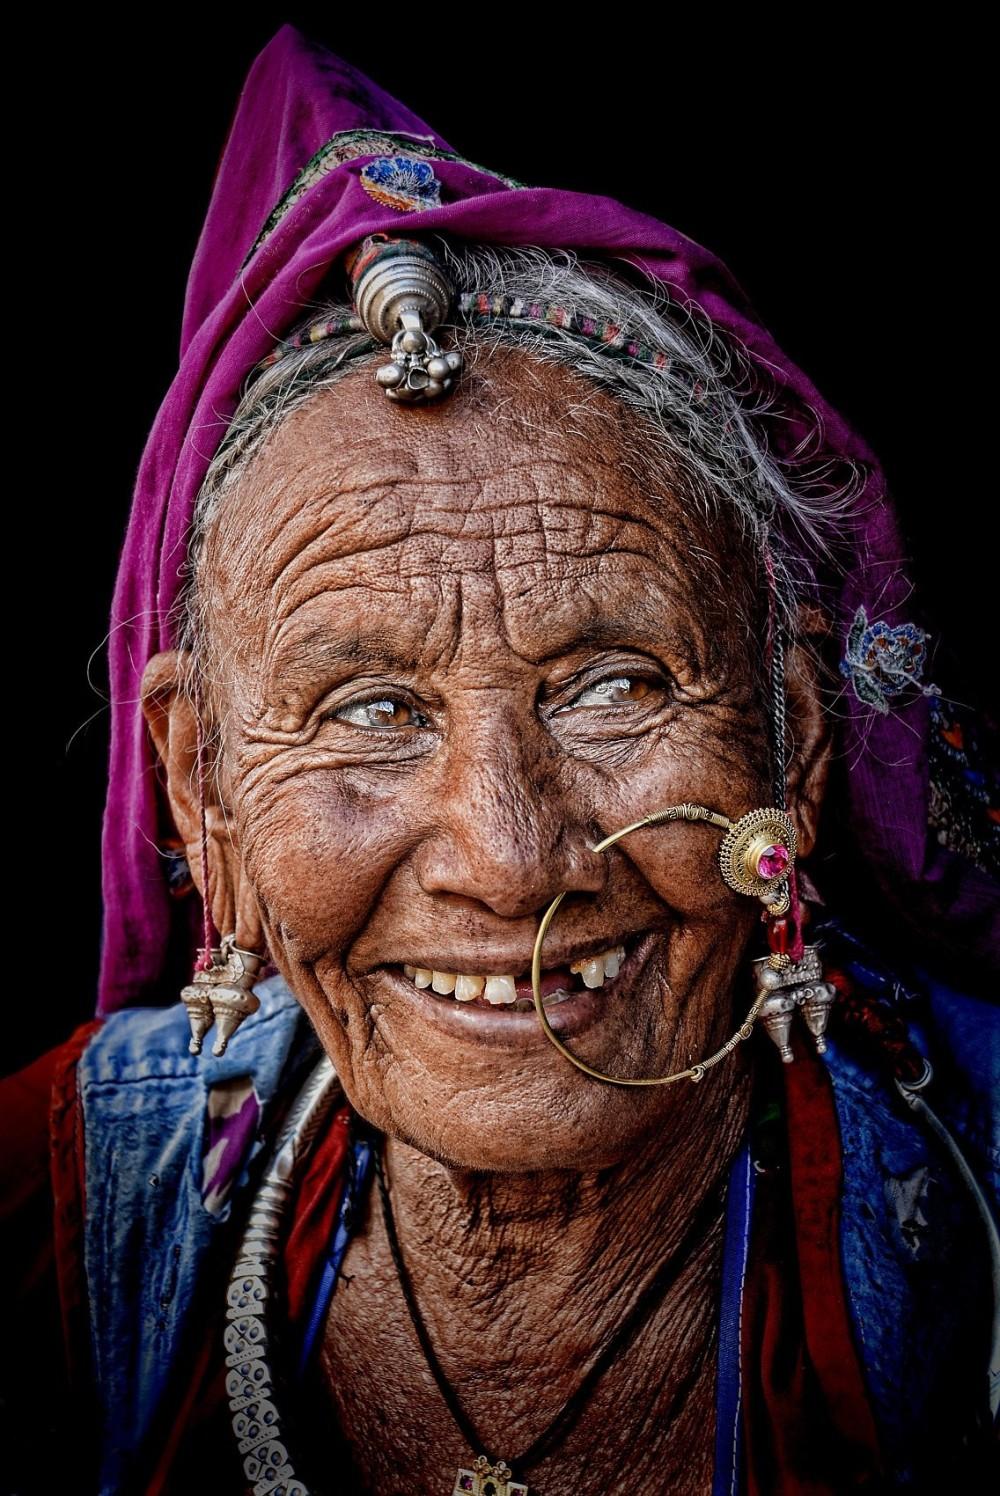 rajasthani woman nose ring street portrait gypsy